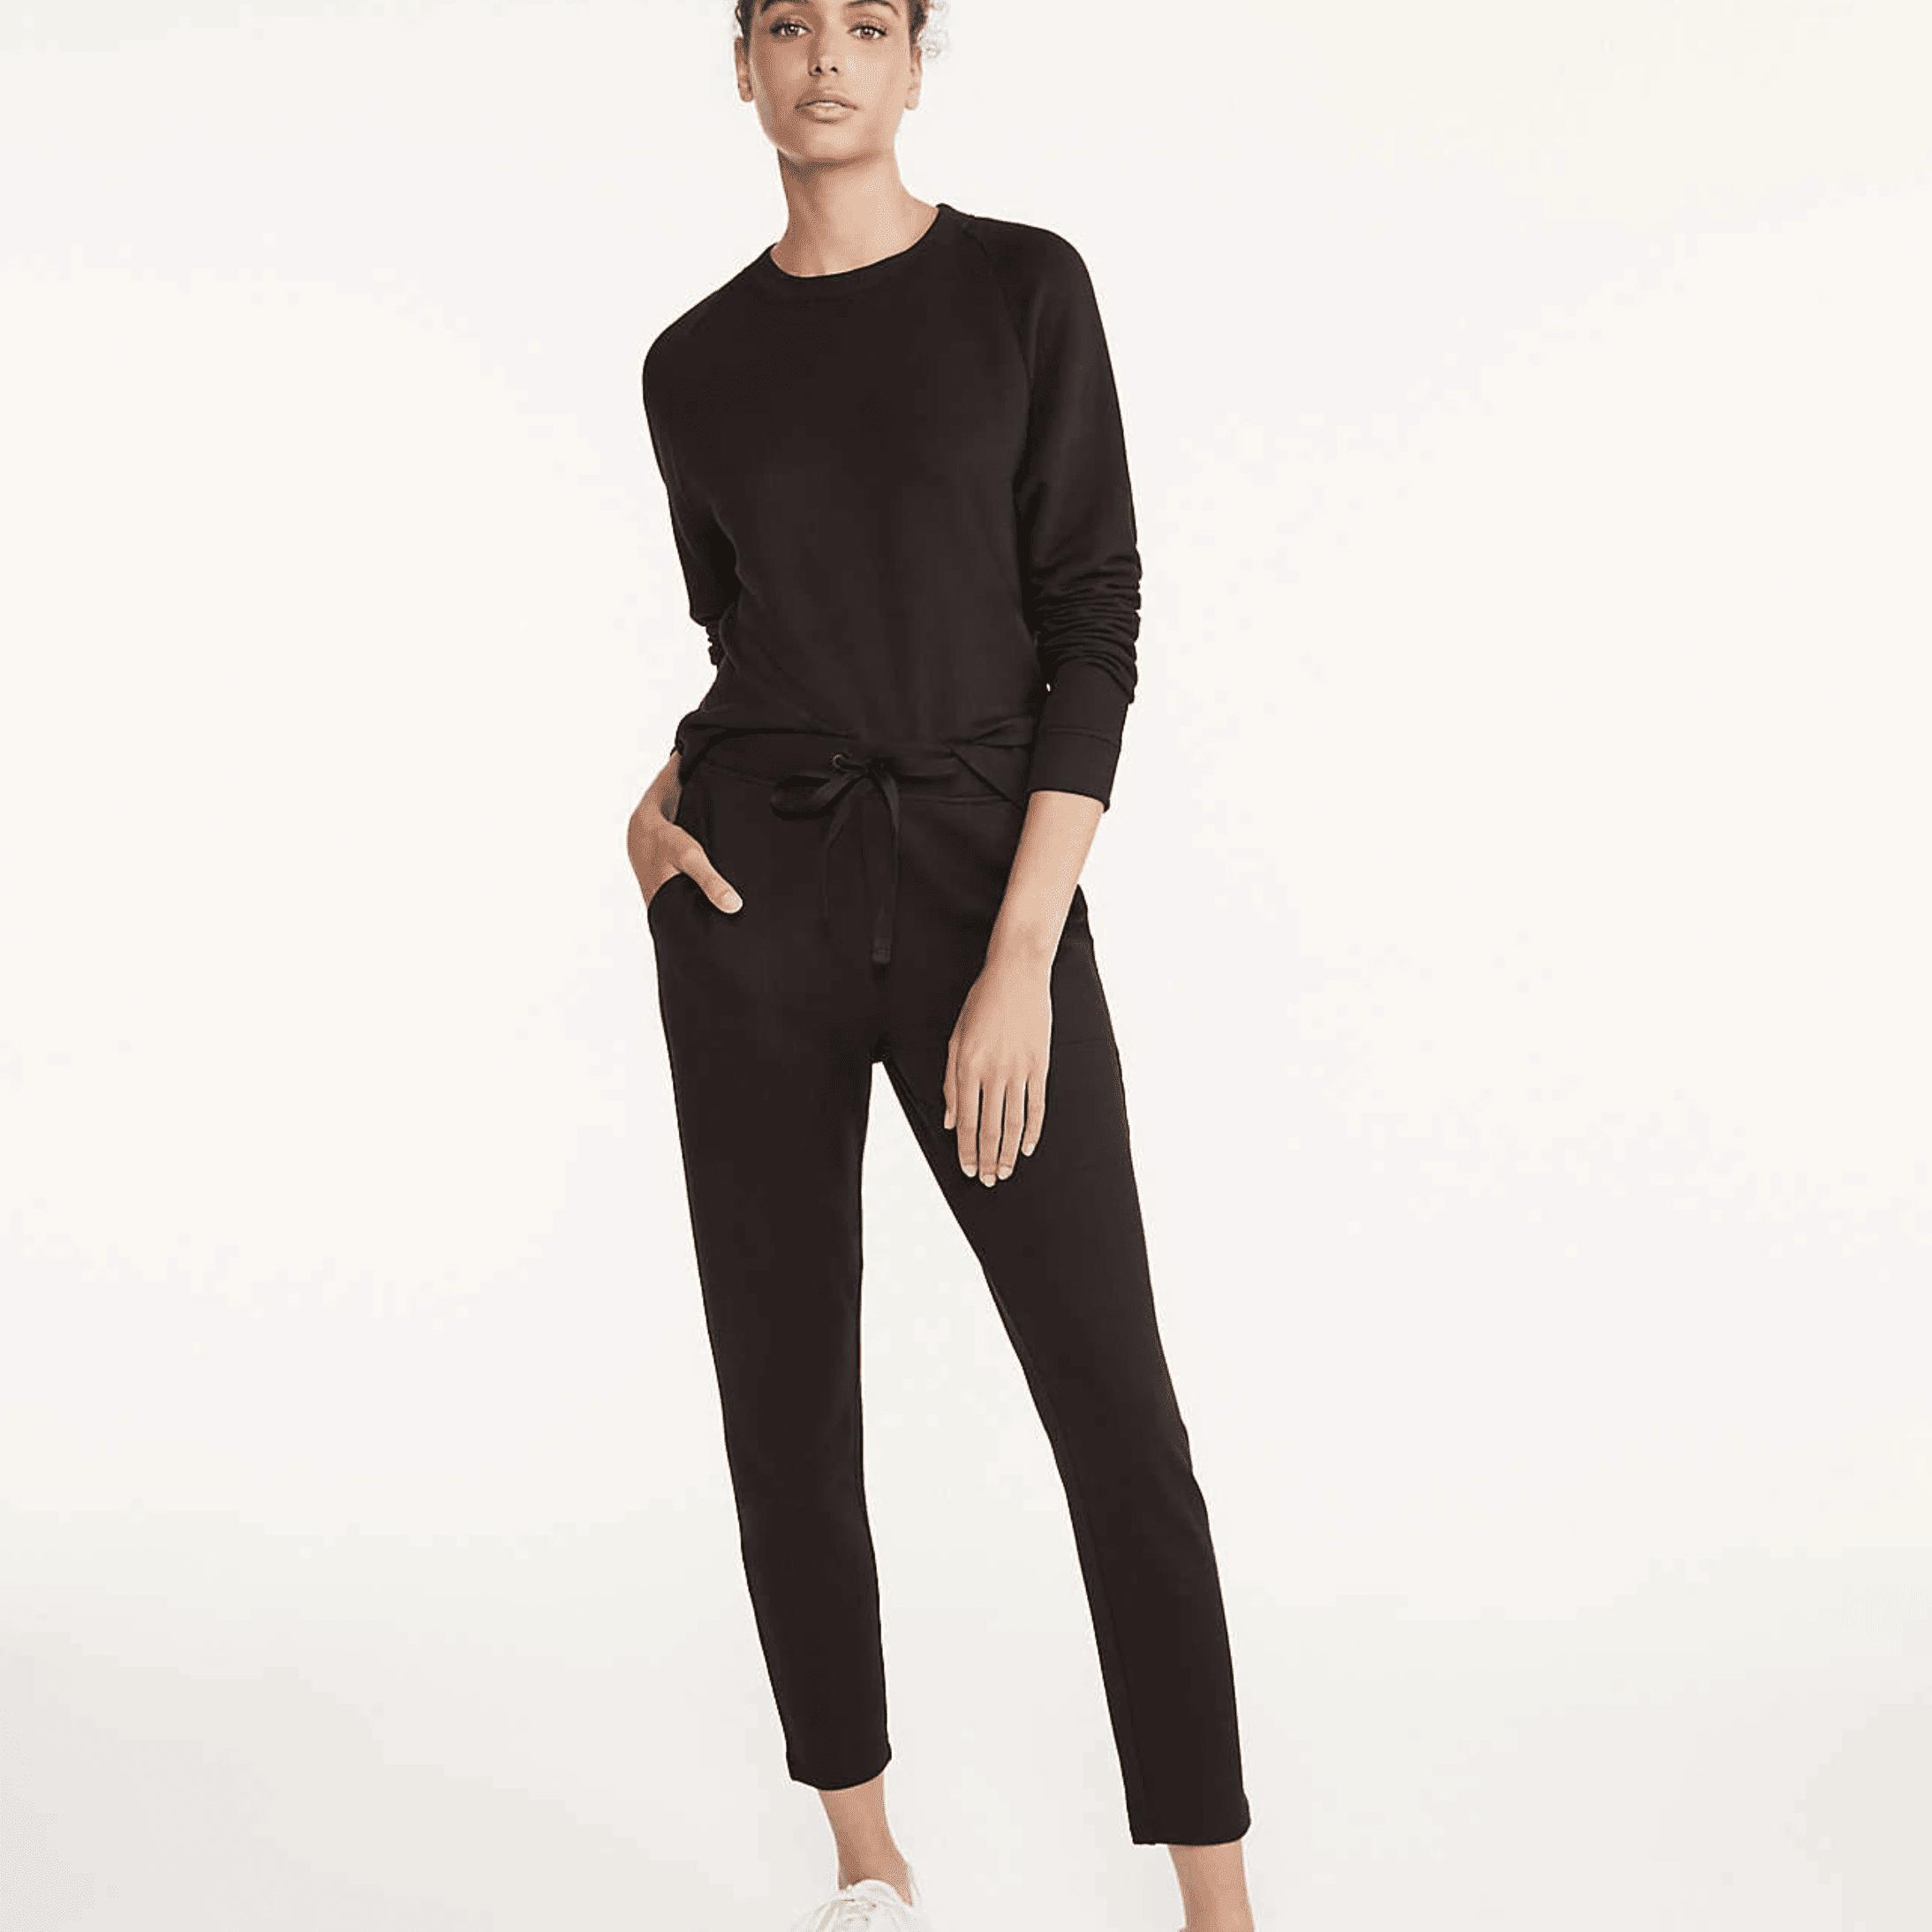 Pantalones deportivos de mezcla suave de la firma Lou and Grey